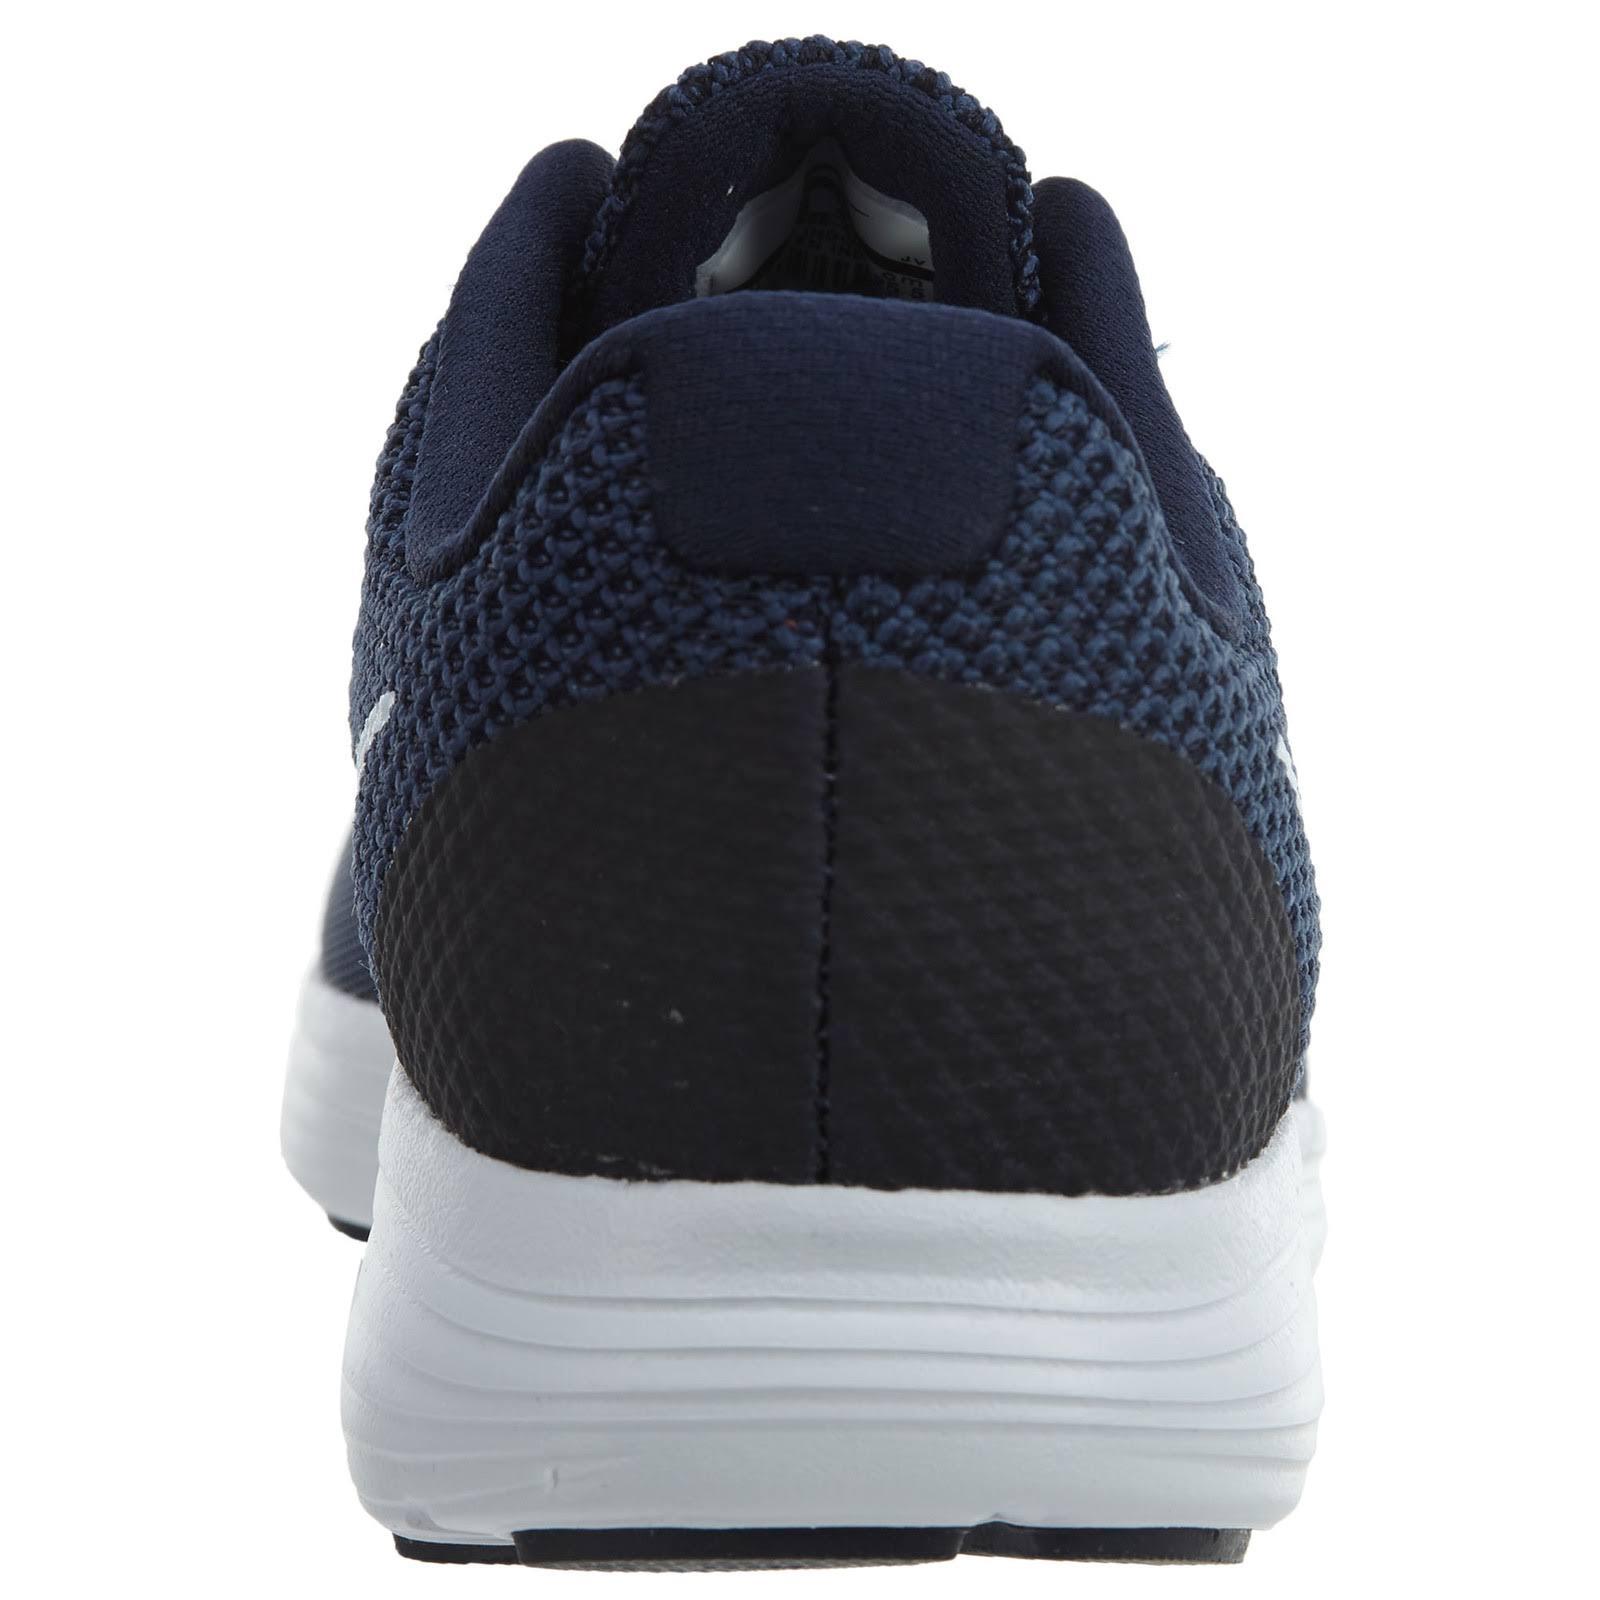 Style Azul Revolution Blanco 3 Nike Mens 819300 BwtUAXqX